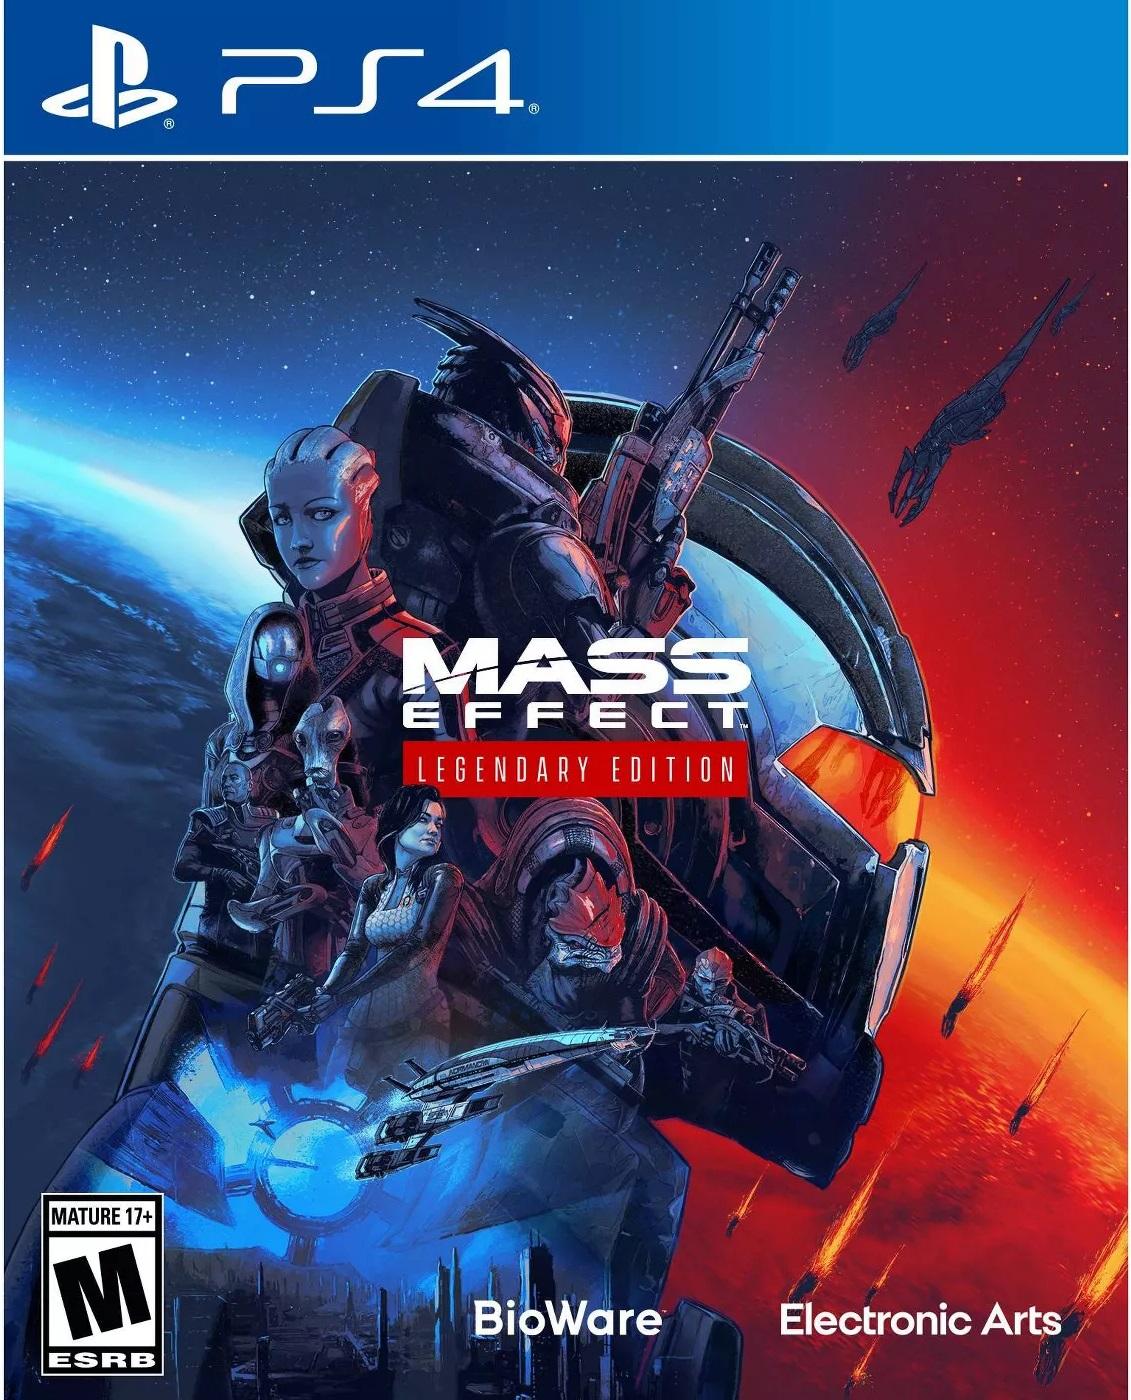 Mass Effect: Legendary Edition - PlayStation 4 - $40